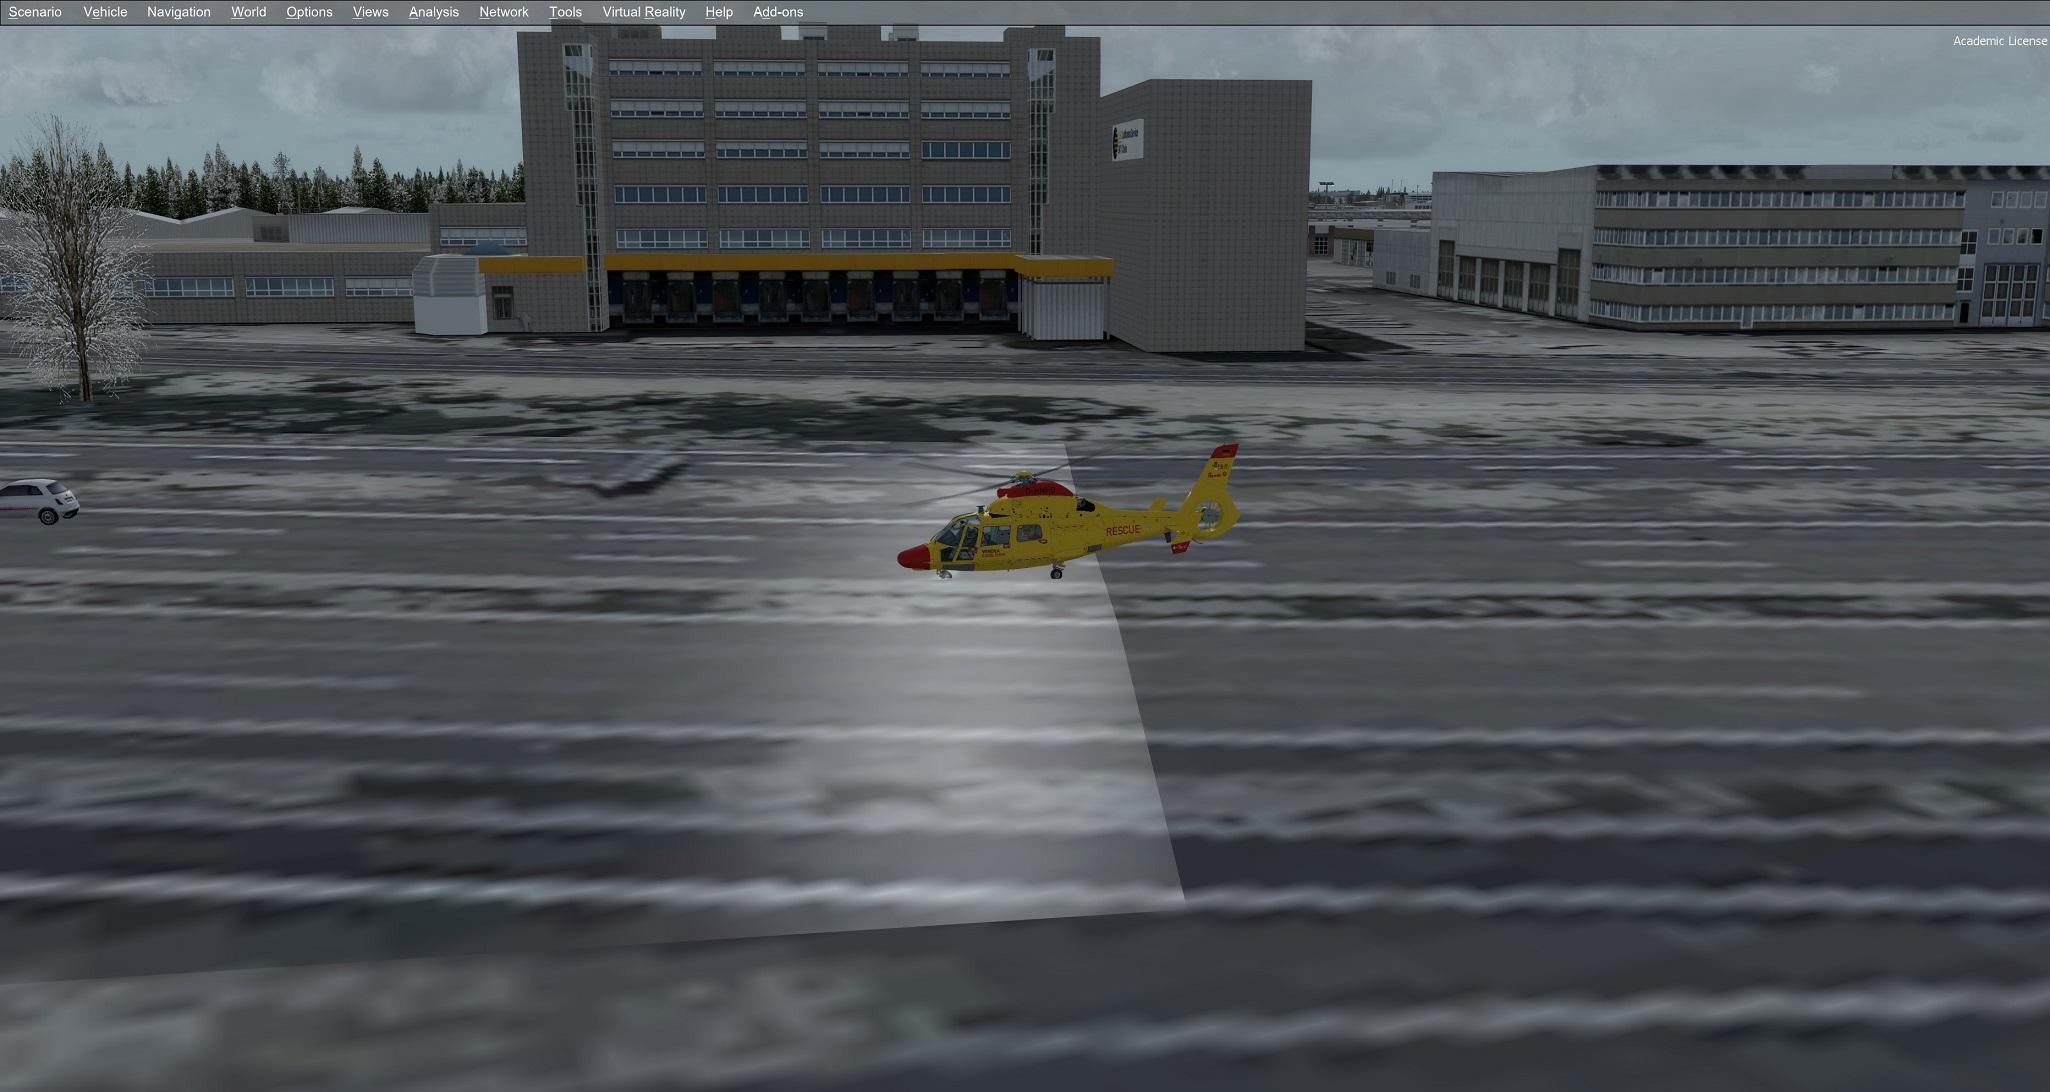 p3dv4 4 EDDF elevation issue - Aerosoft Mega Airports - AEROSOFT